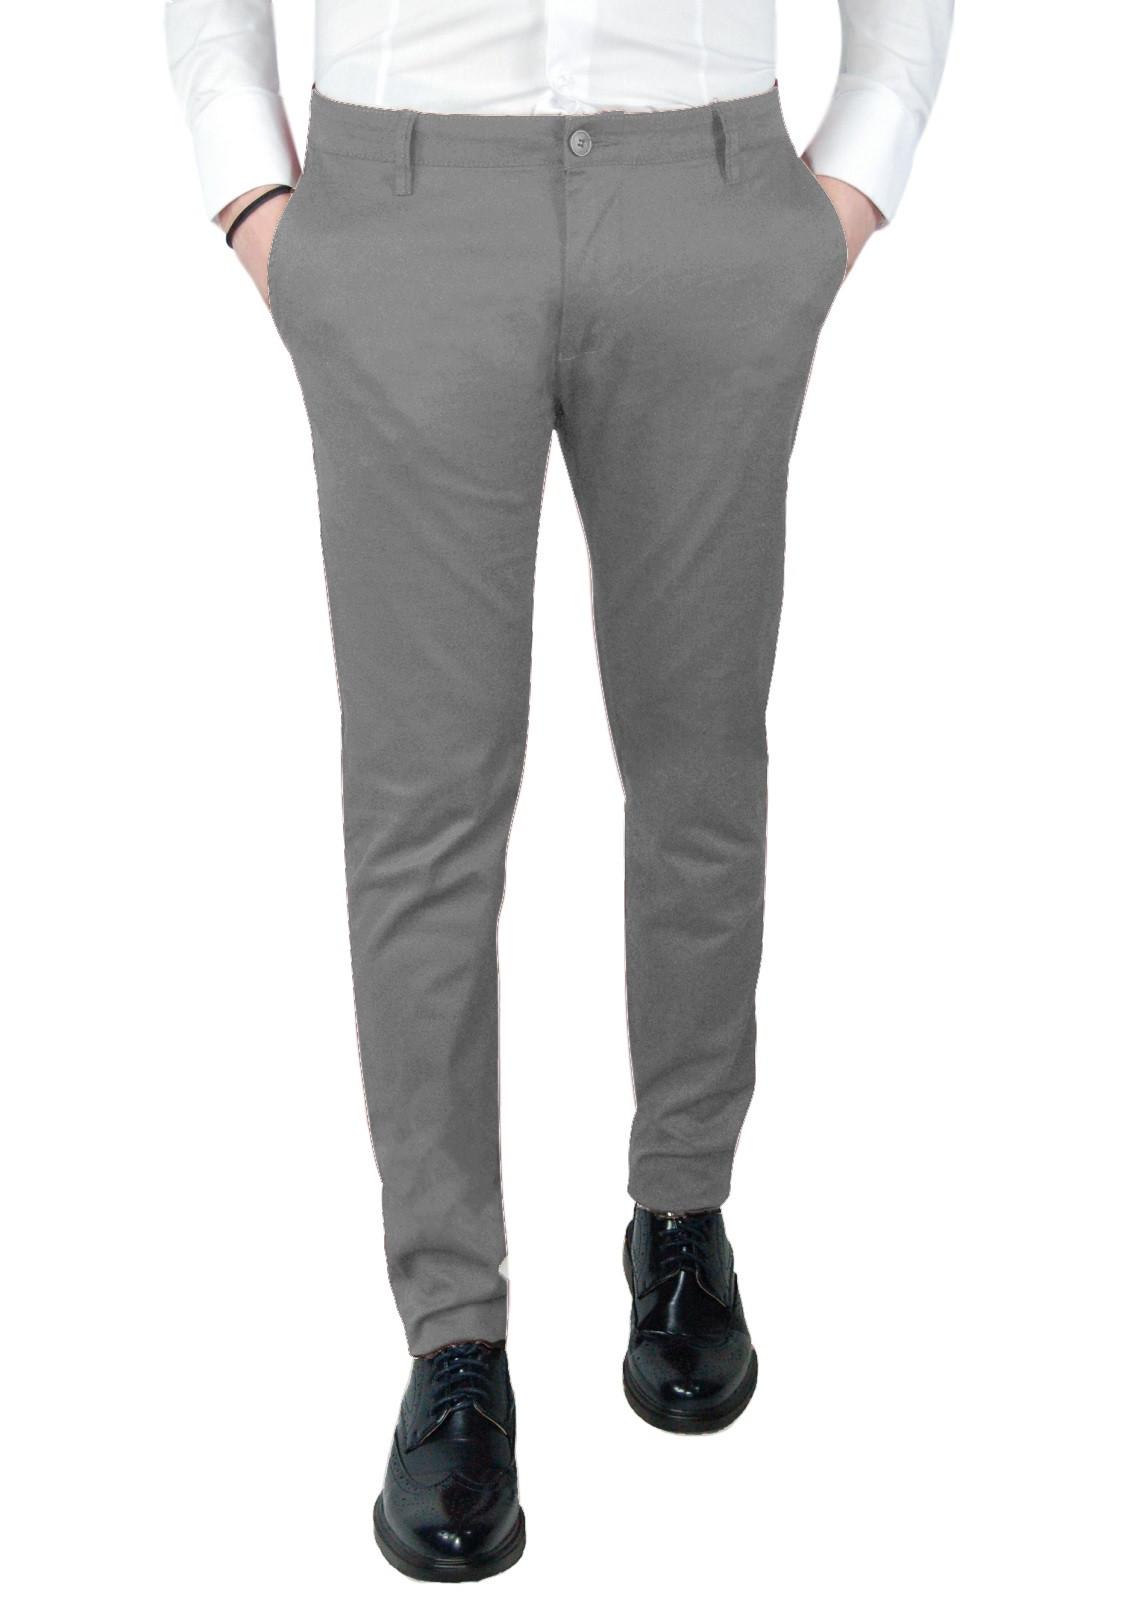 Pantalone-Uomo-Chino-Slim-fit-Primaverile-tasca-america-Bianco-Grigio-Senape-Bei miniatura 19